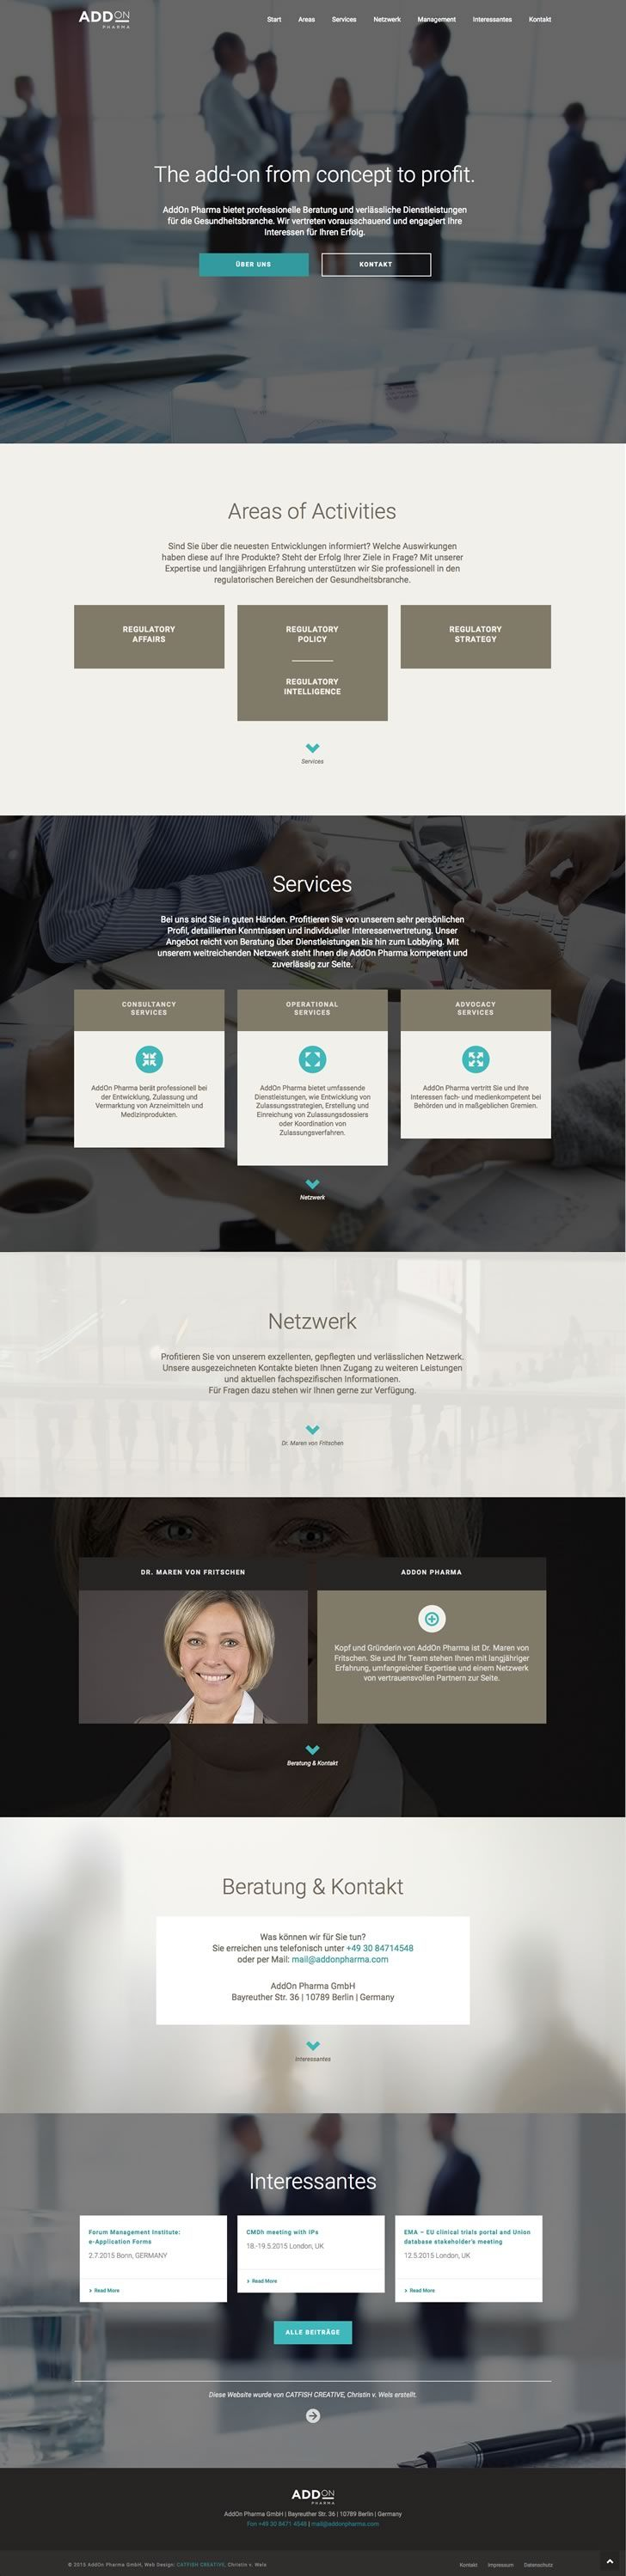 Catfish Creative | Marken- und Designagentur 360° | Web Design AddOn Pharma | Take a look at www.catfishcreative.de